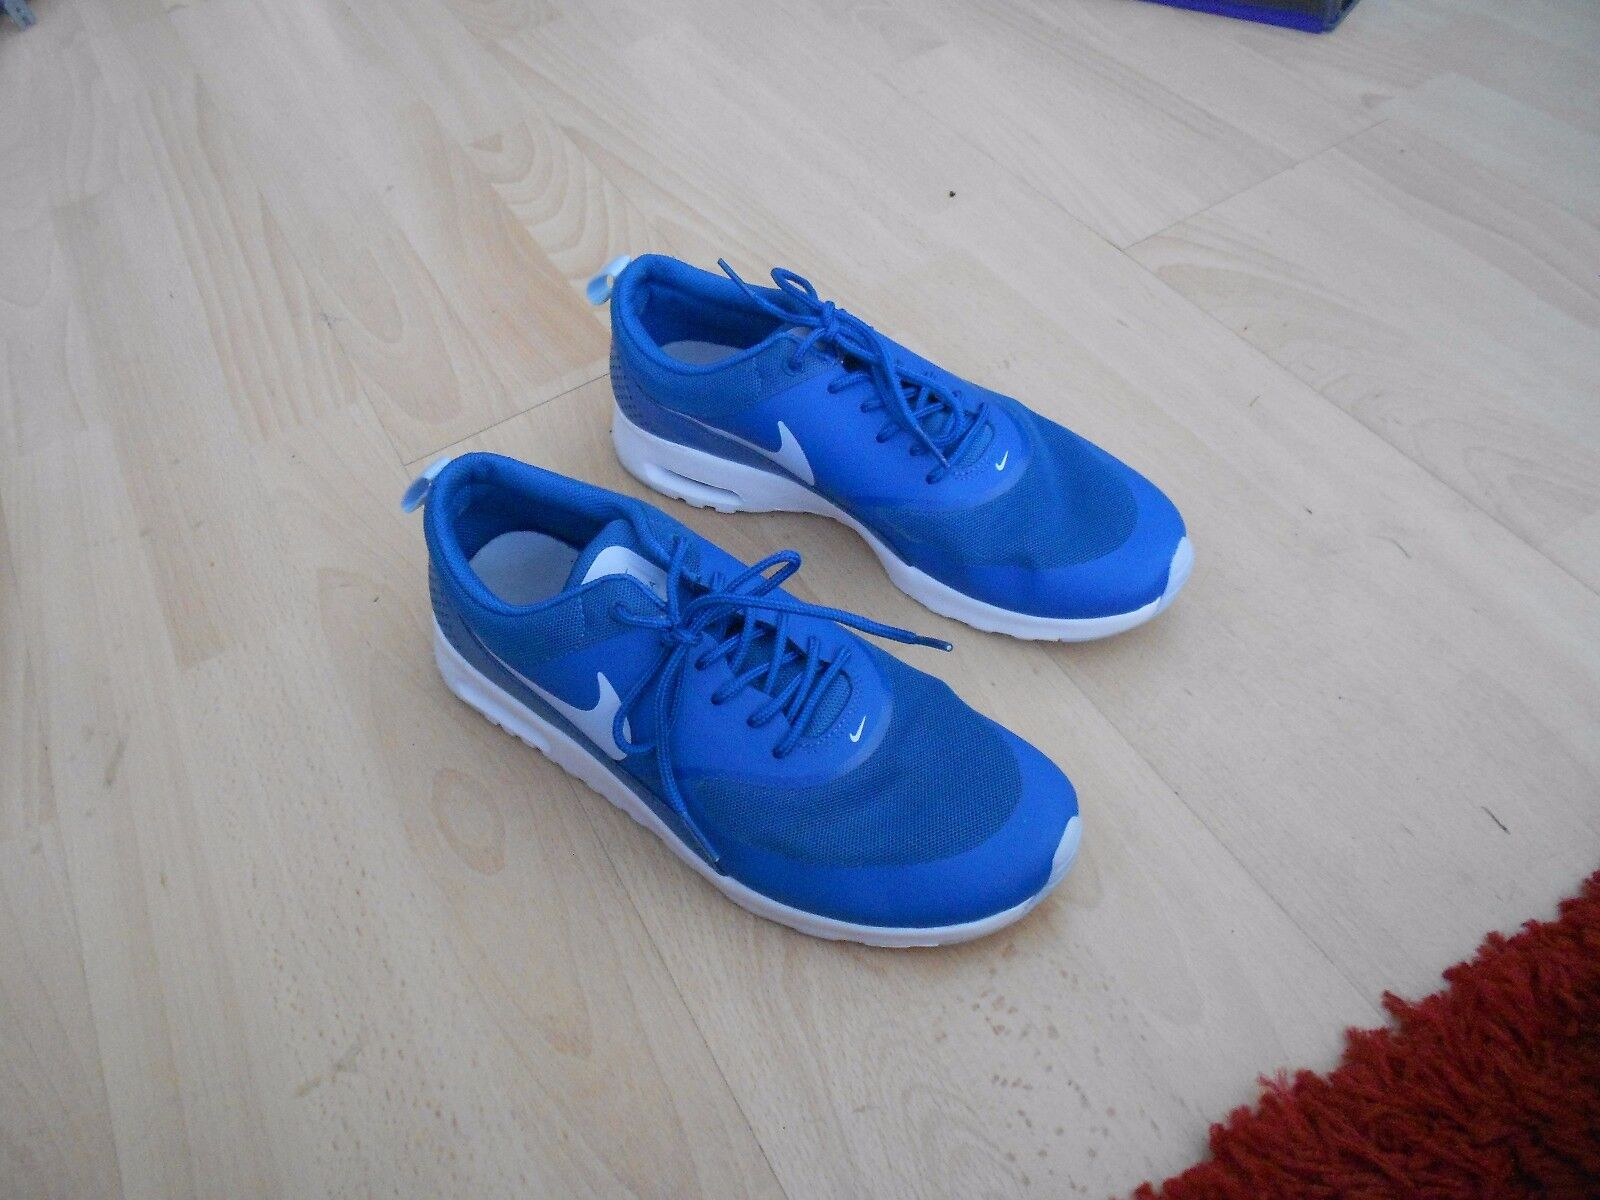 WOMENS NIKE AIR MAX THEA RUNNING TRAINERS -- SZ 8 - BRIGADE blueE